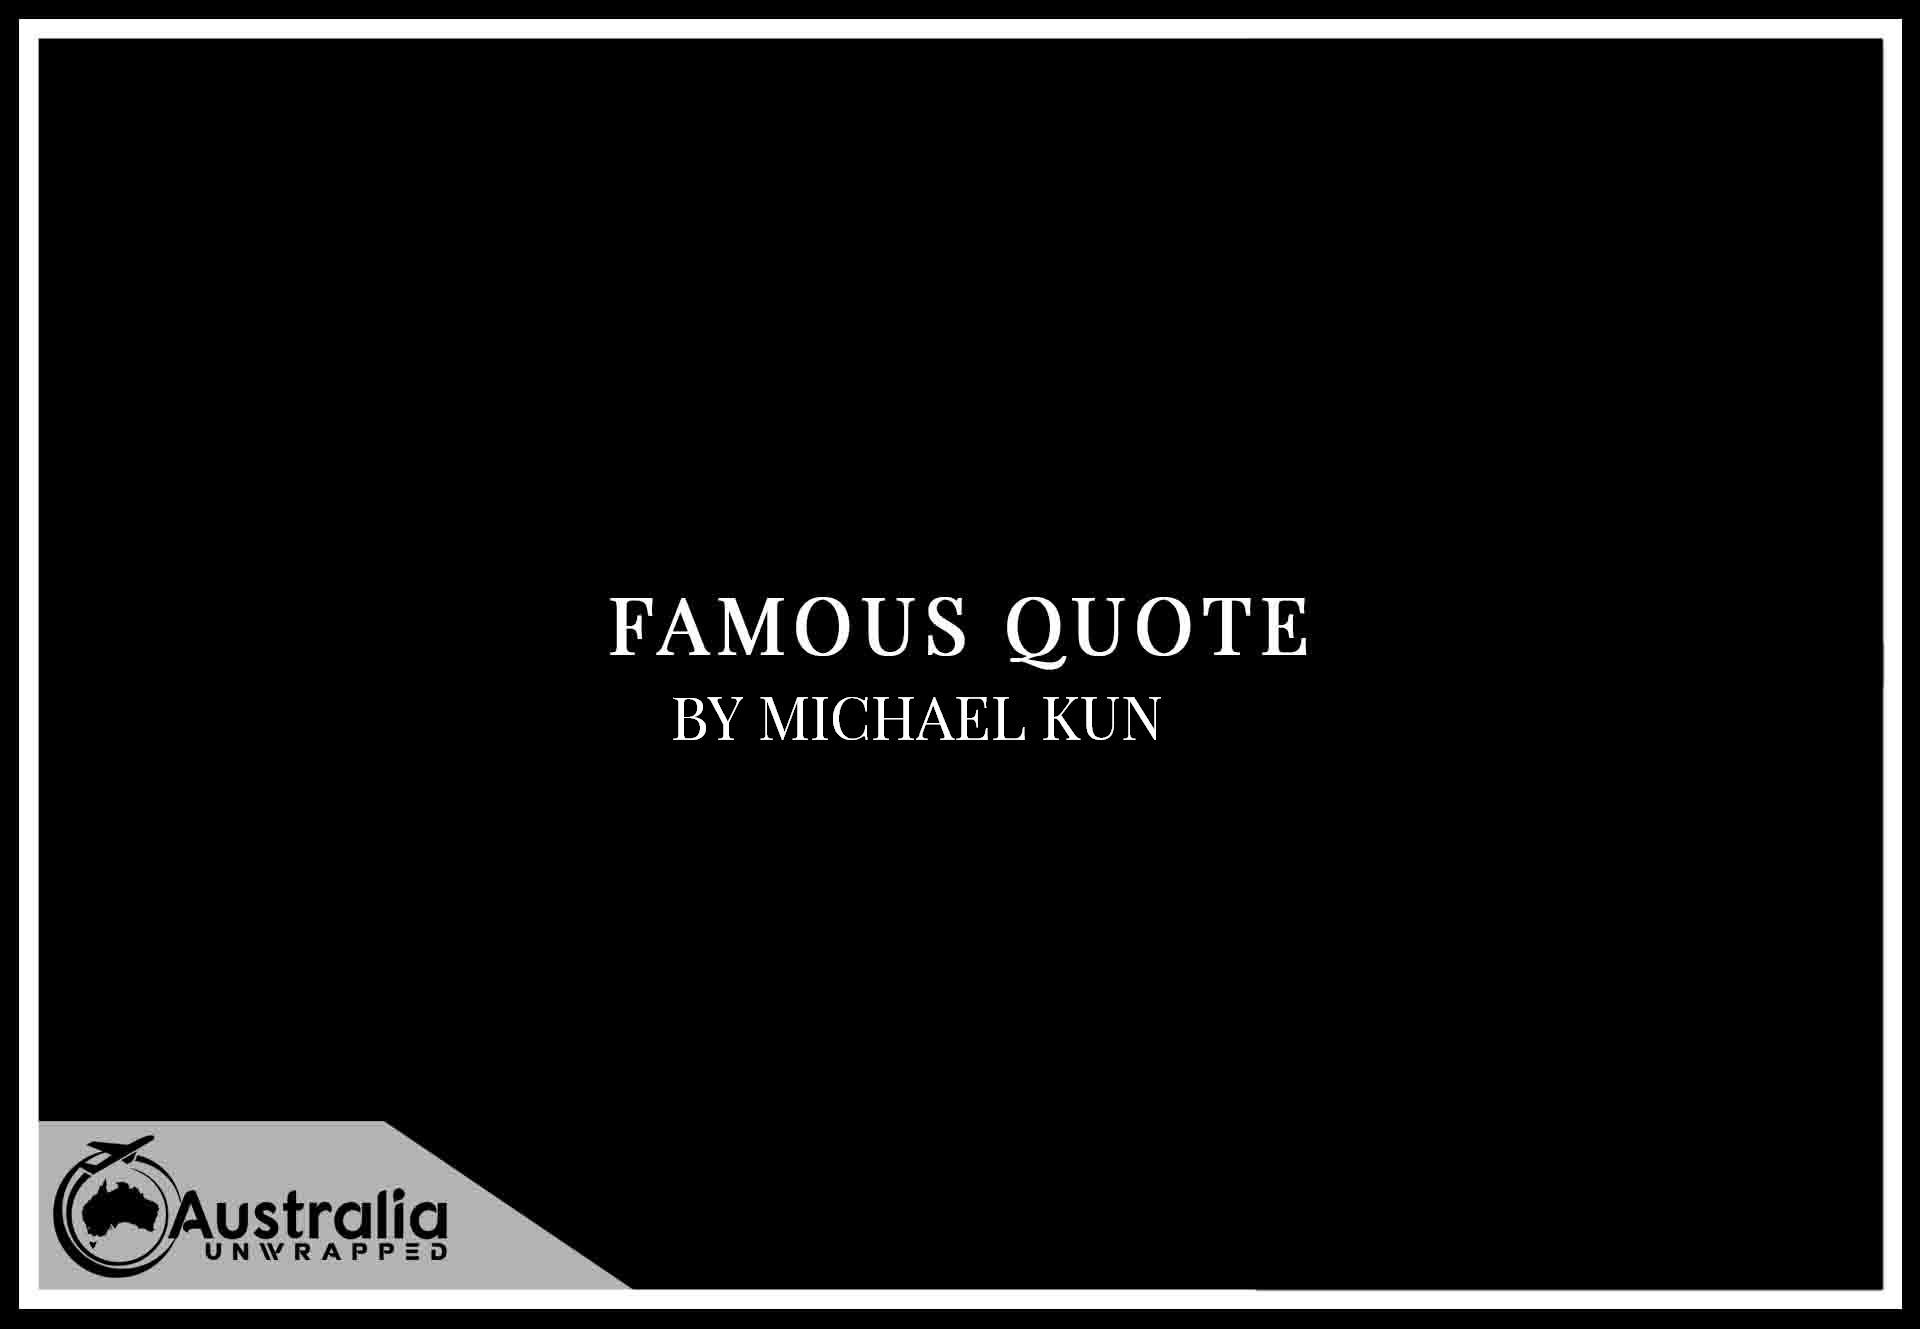 Top 1 Famous Quotes by Author Michael Kun